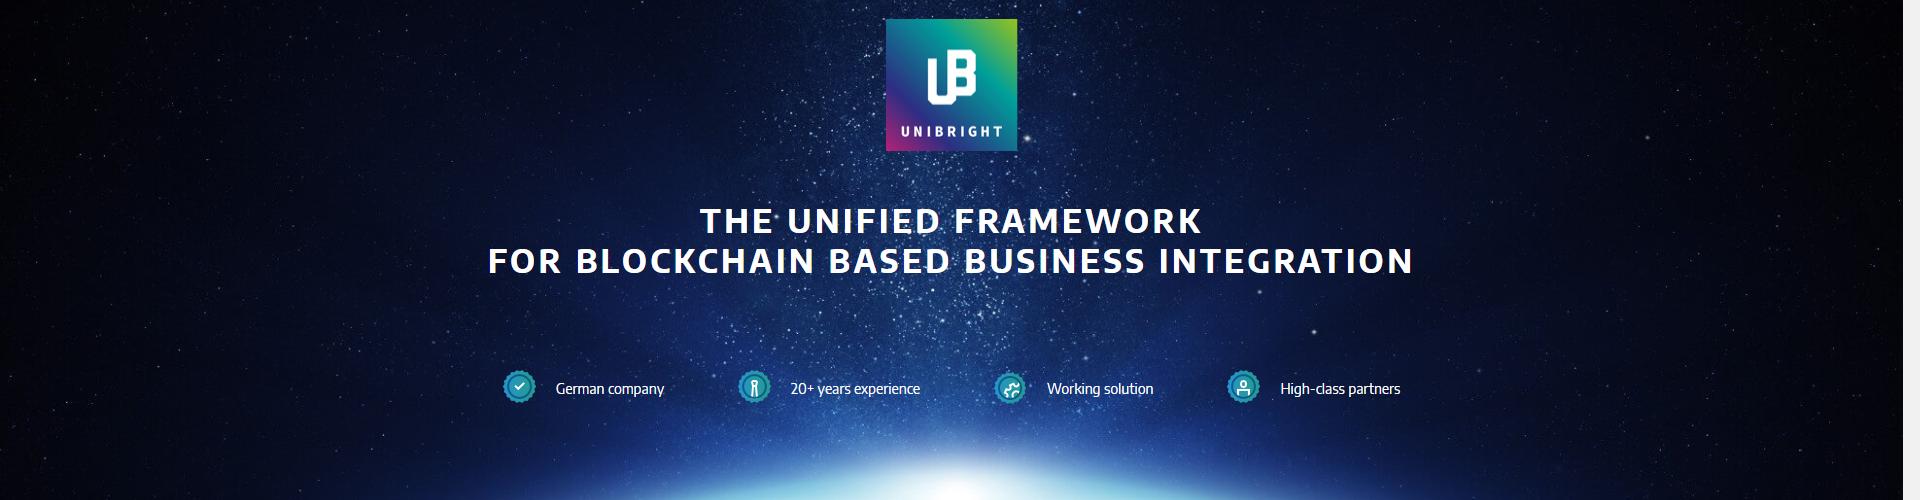 Unibright - Blockchain Integrations for Enterprise